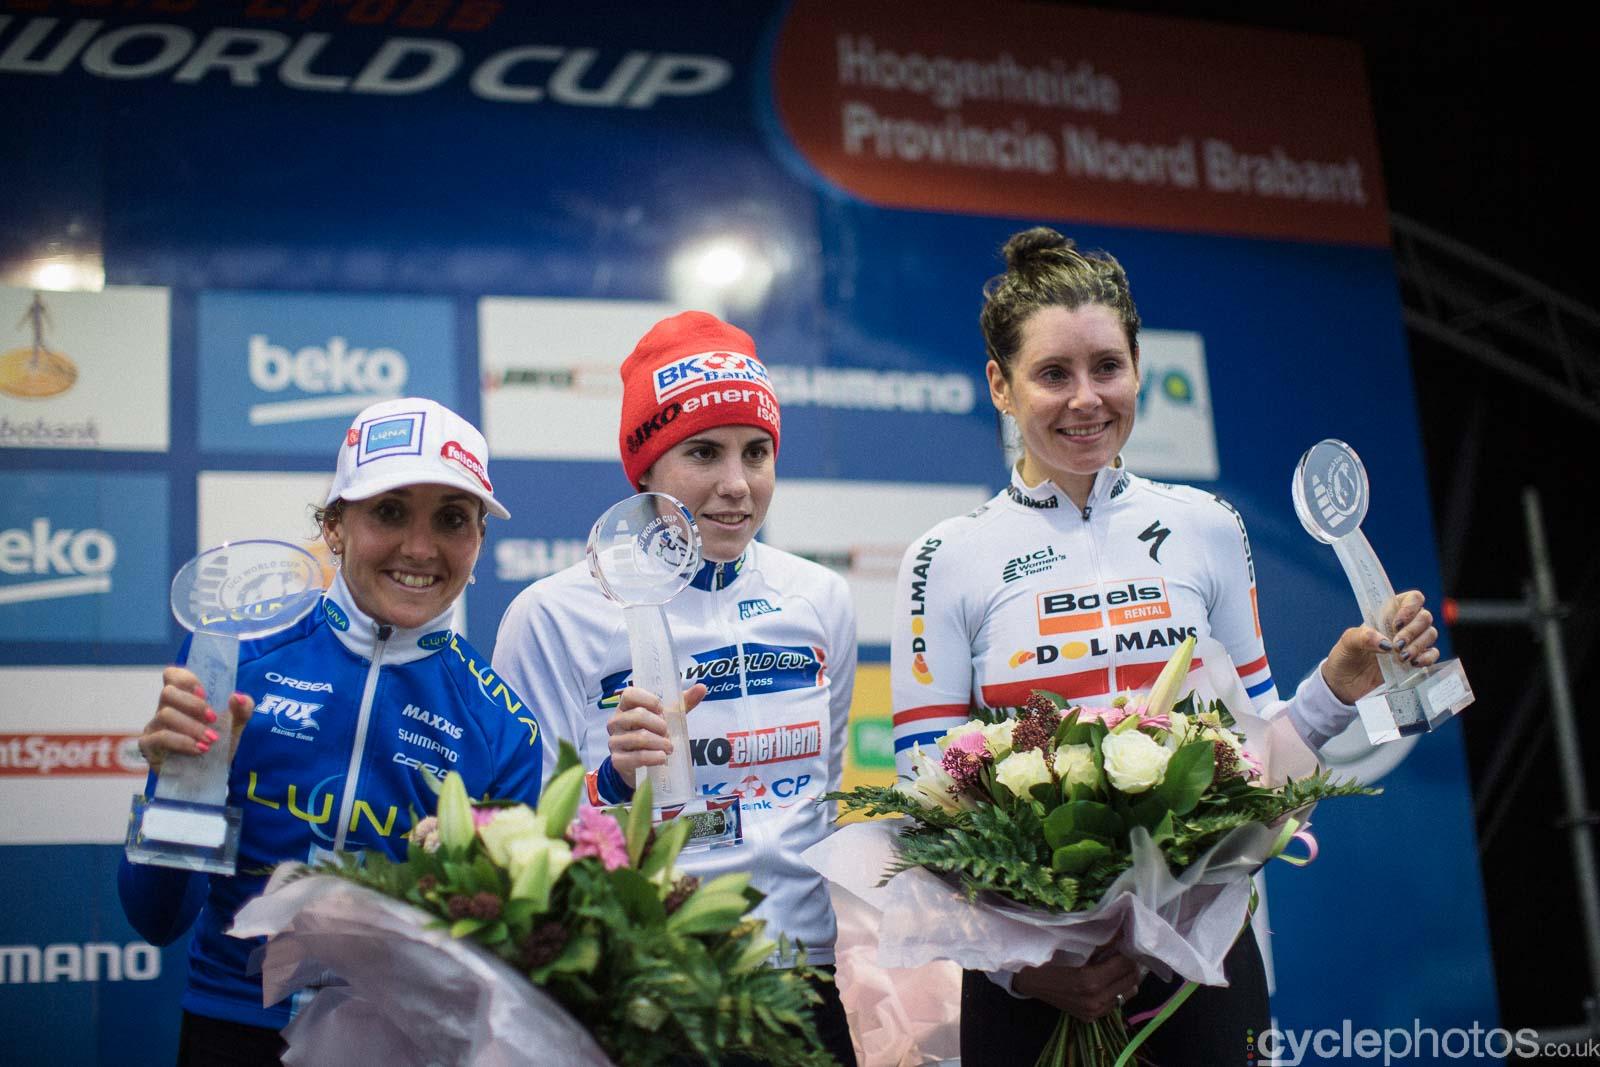 2016-cyclephotos-cyclocross-hoogerheide-143137-women-elite-world-cup-overall